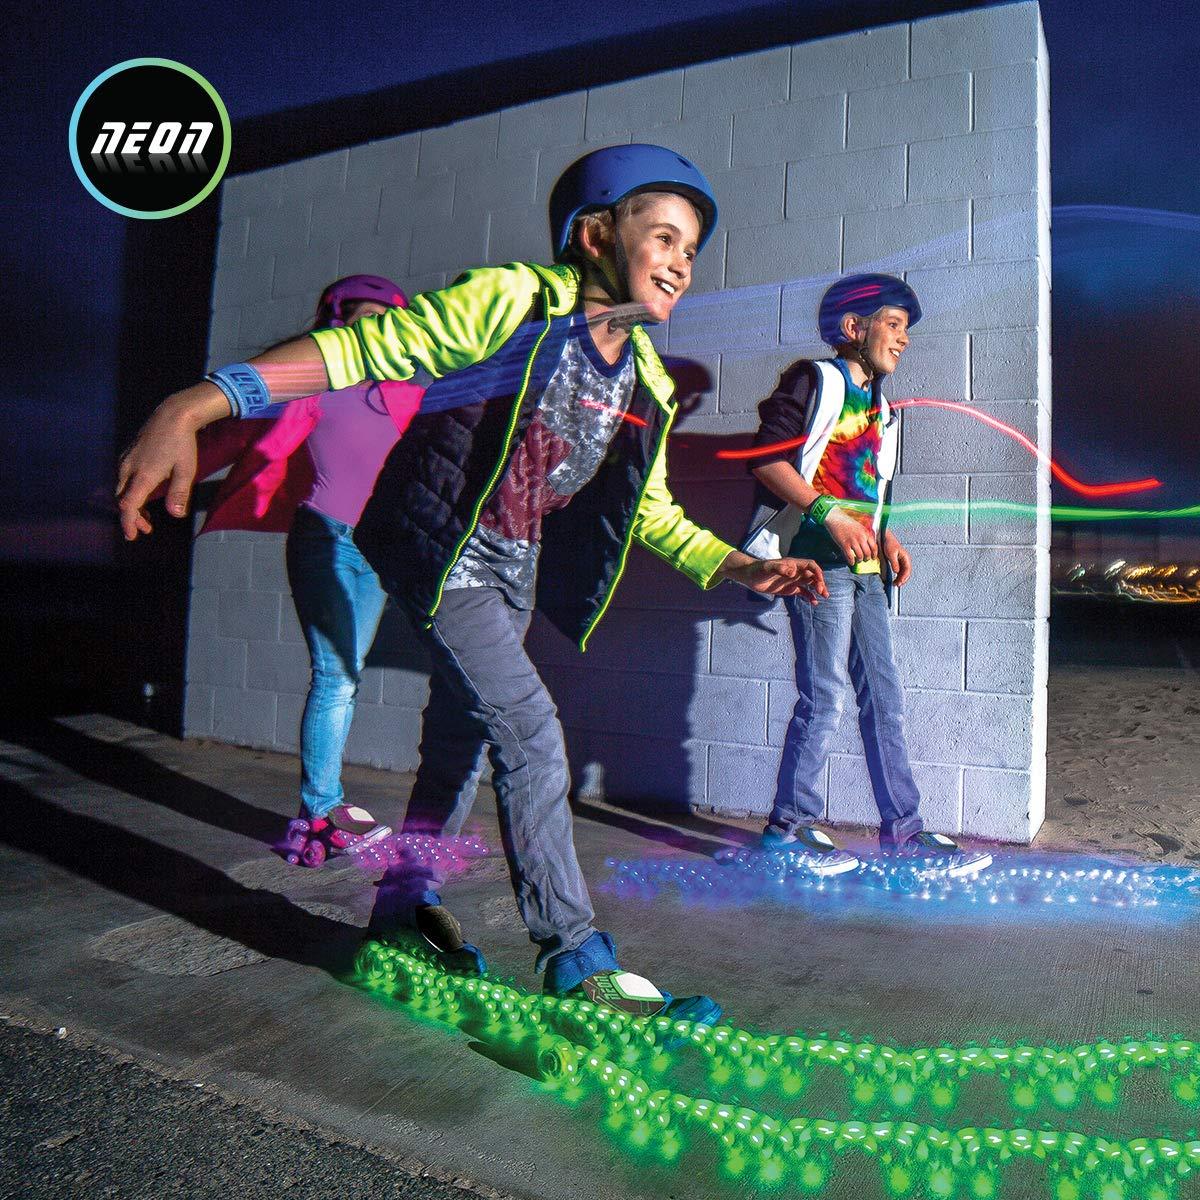 Flashing Heel Wheels Clip on Skates